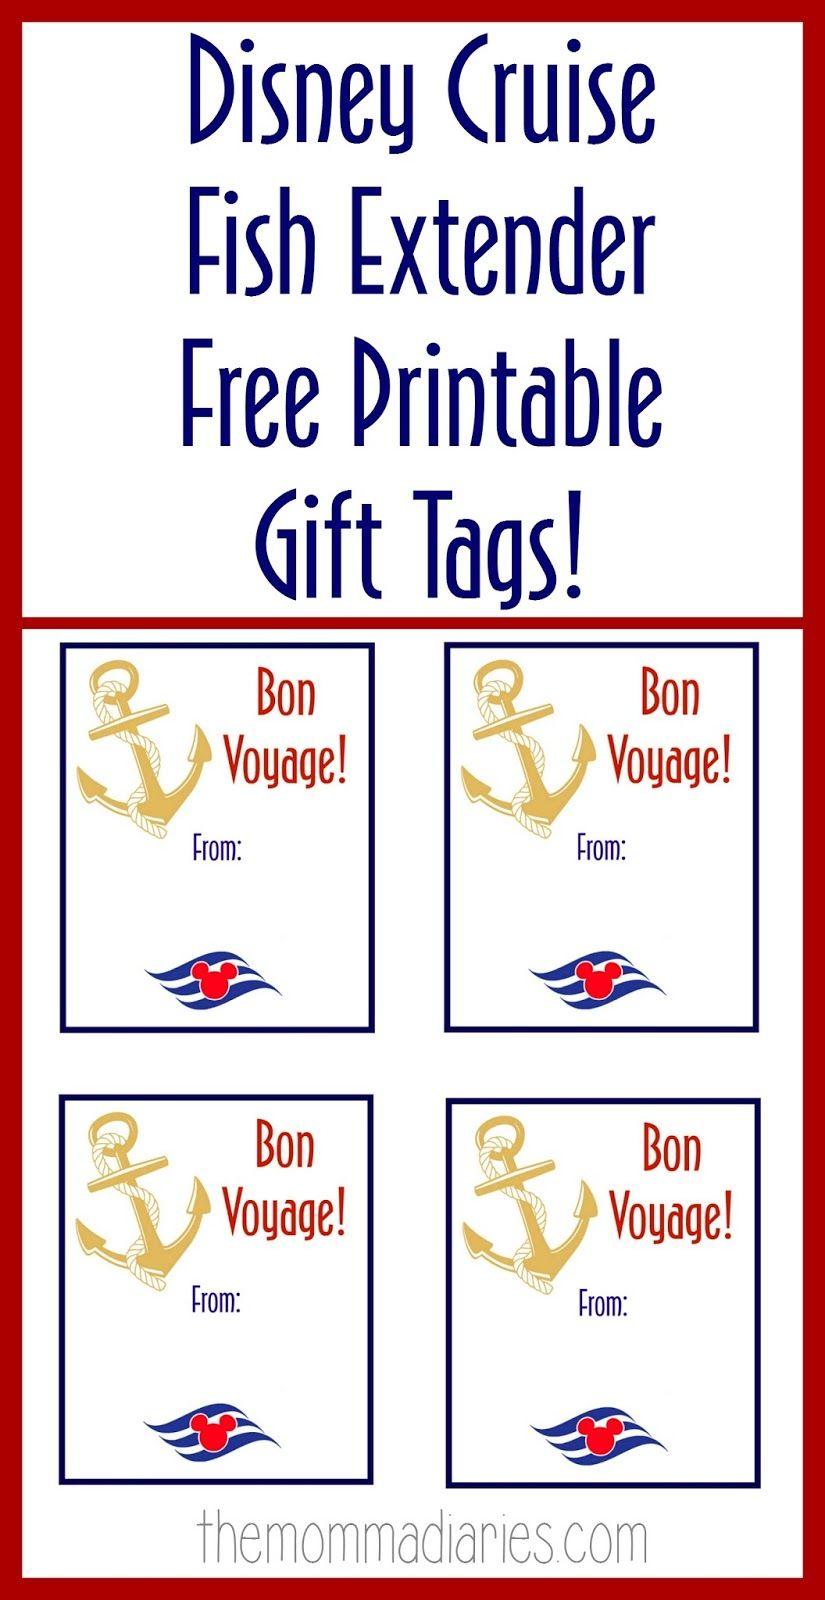 Disney Cruise Fish Extender Printable Gift Tags Disney Cruise Fish Extender Disney Cruise Fish Extender Gifts Disney Cruise